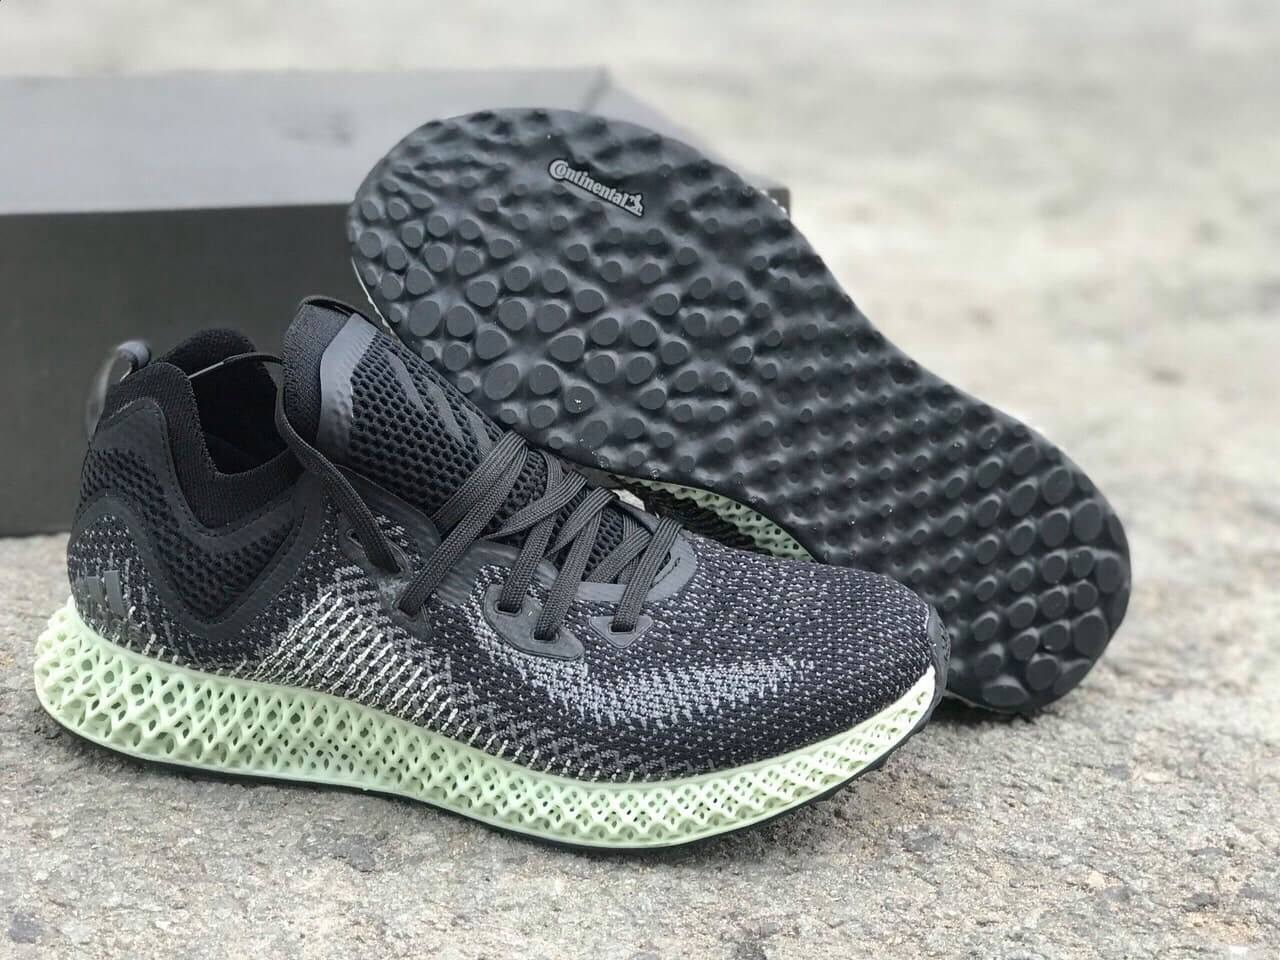 Adidas 4D Craft